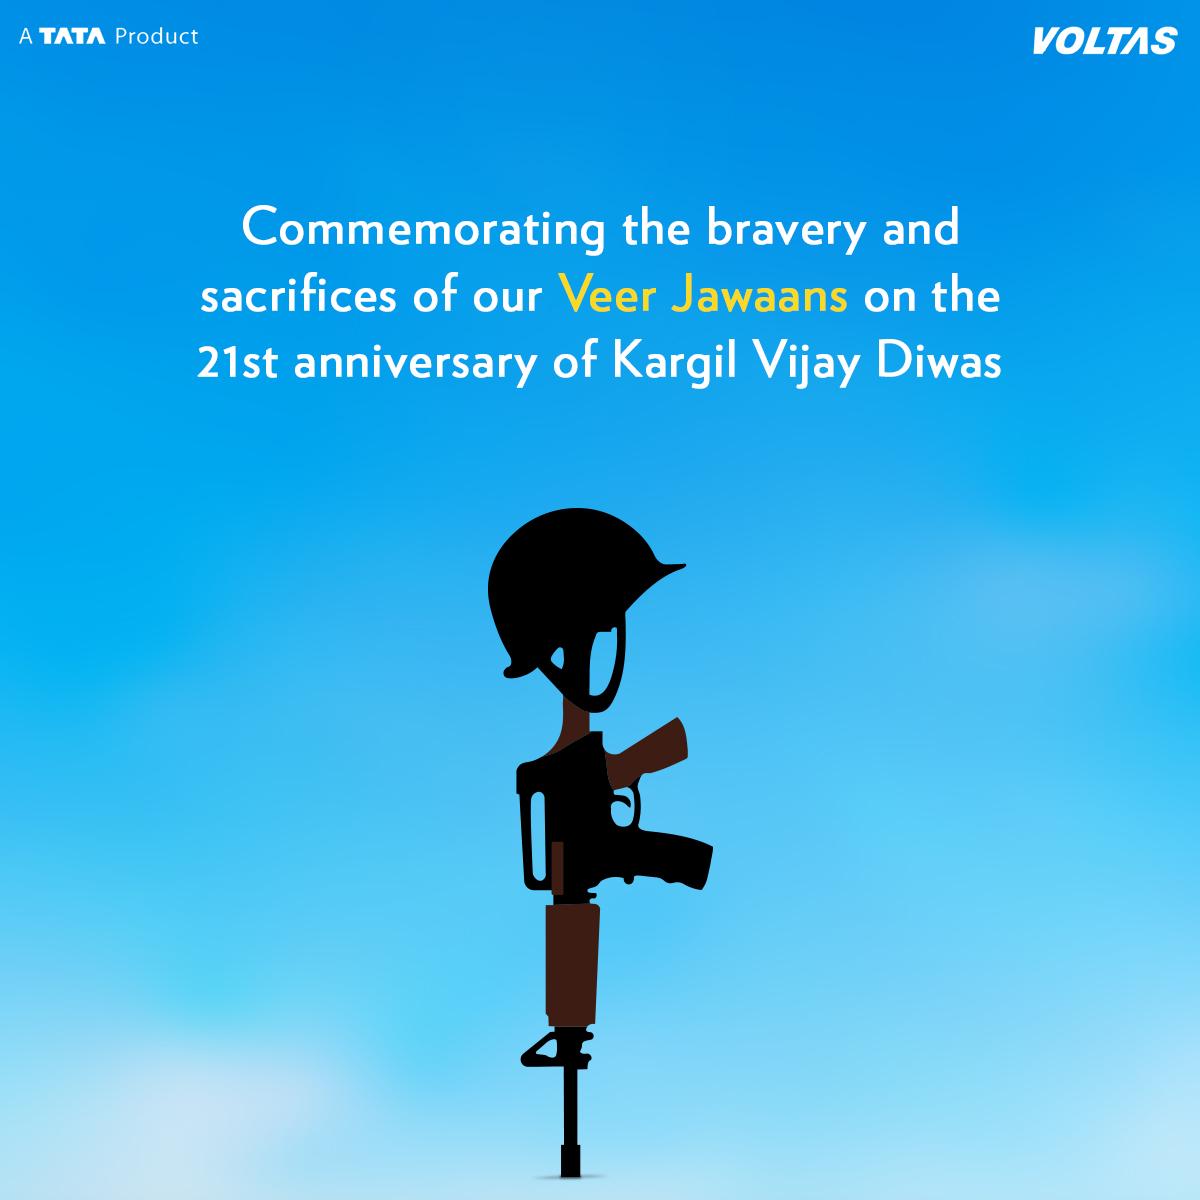 The tales of their bravery, sacrifices and triumph will never be forgotten. Voltas salutes the Indian Army for their selfless service and love towards the nation. #KargilVijayDiwas #KargilWar #VijayDiwas #Voltas https://t.co/l9vCXa12K6